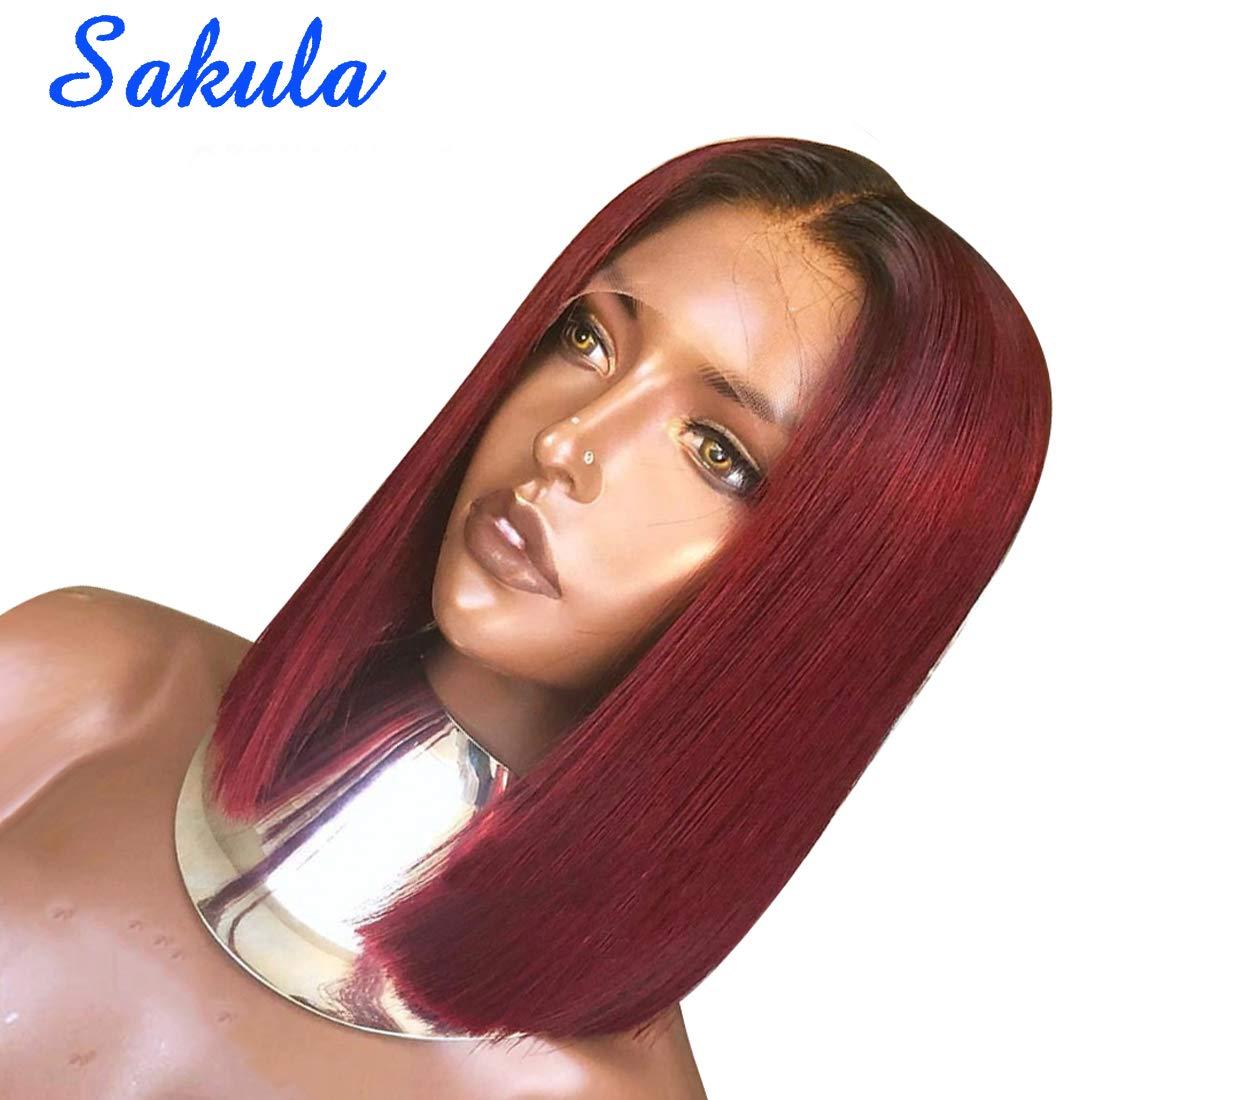 B074BSHZFG Sakula Brazilian Virgin Remy Lace Frontal Bobo Wig with Human Hair 10 Inches 61l5hLwpUuL._SL1250_